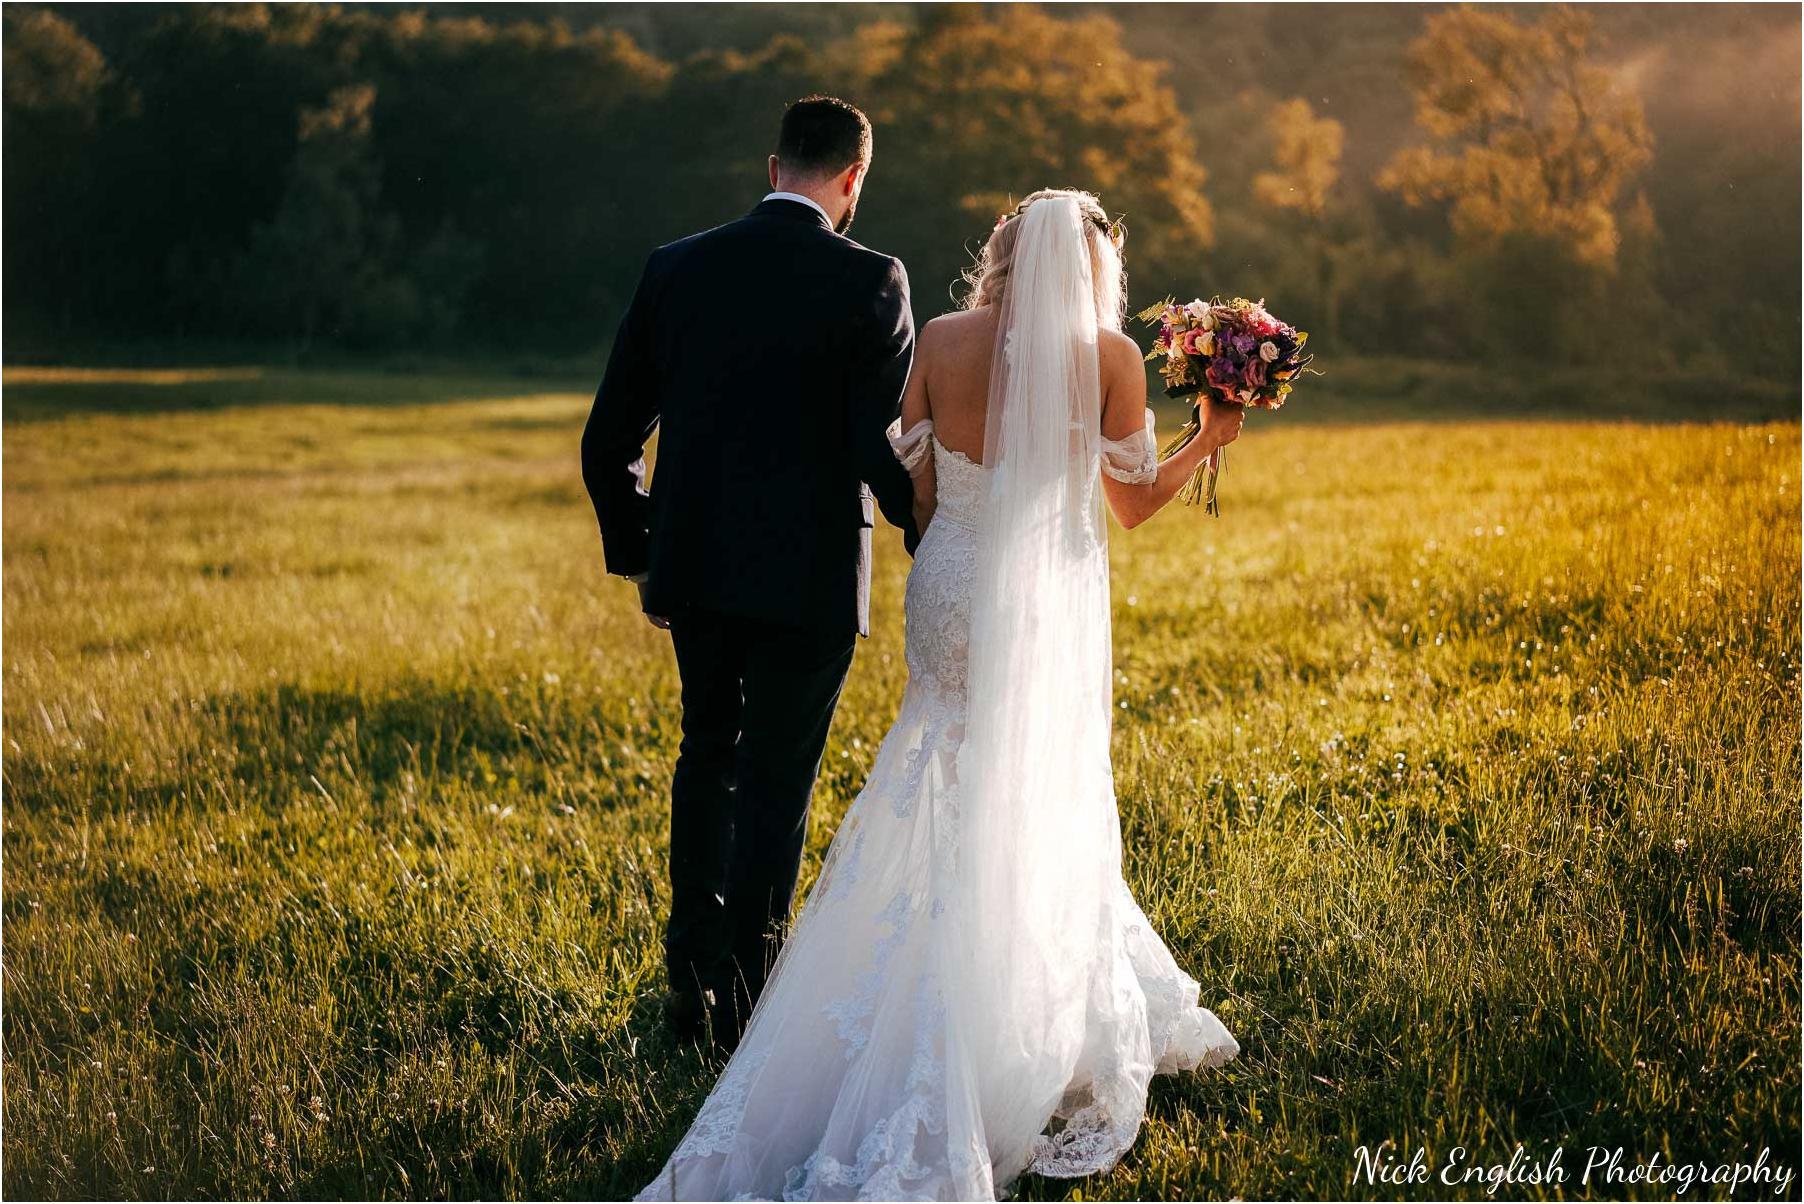 Whitebottom_Farm_Wedding_Manchester_Photograph-98.jpg